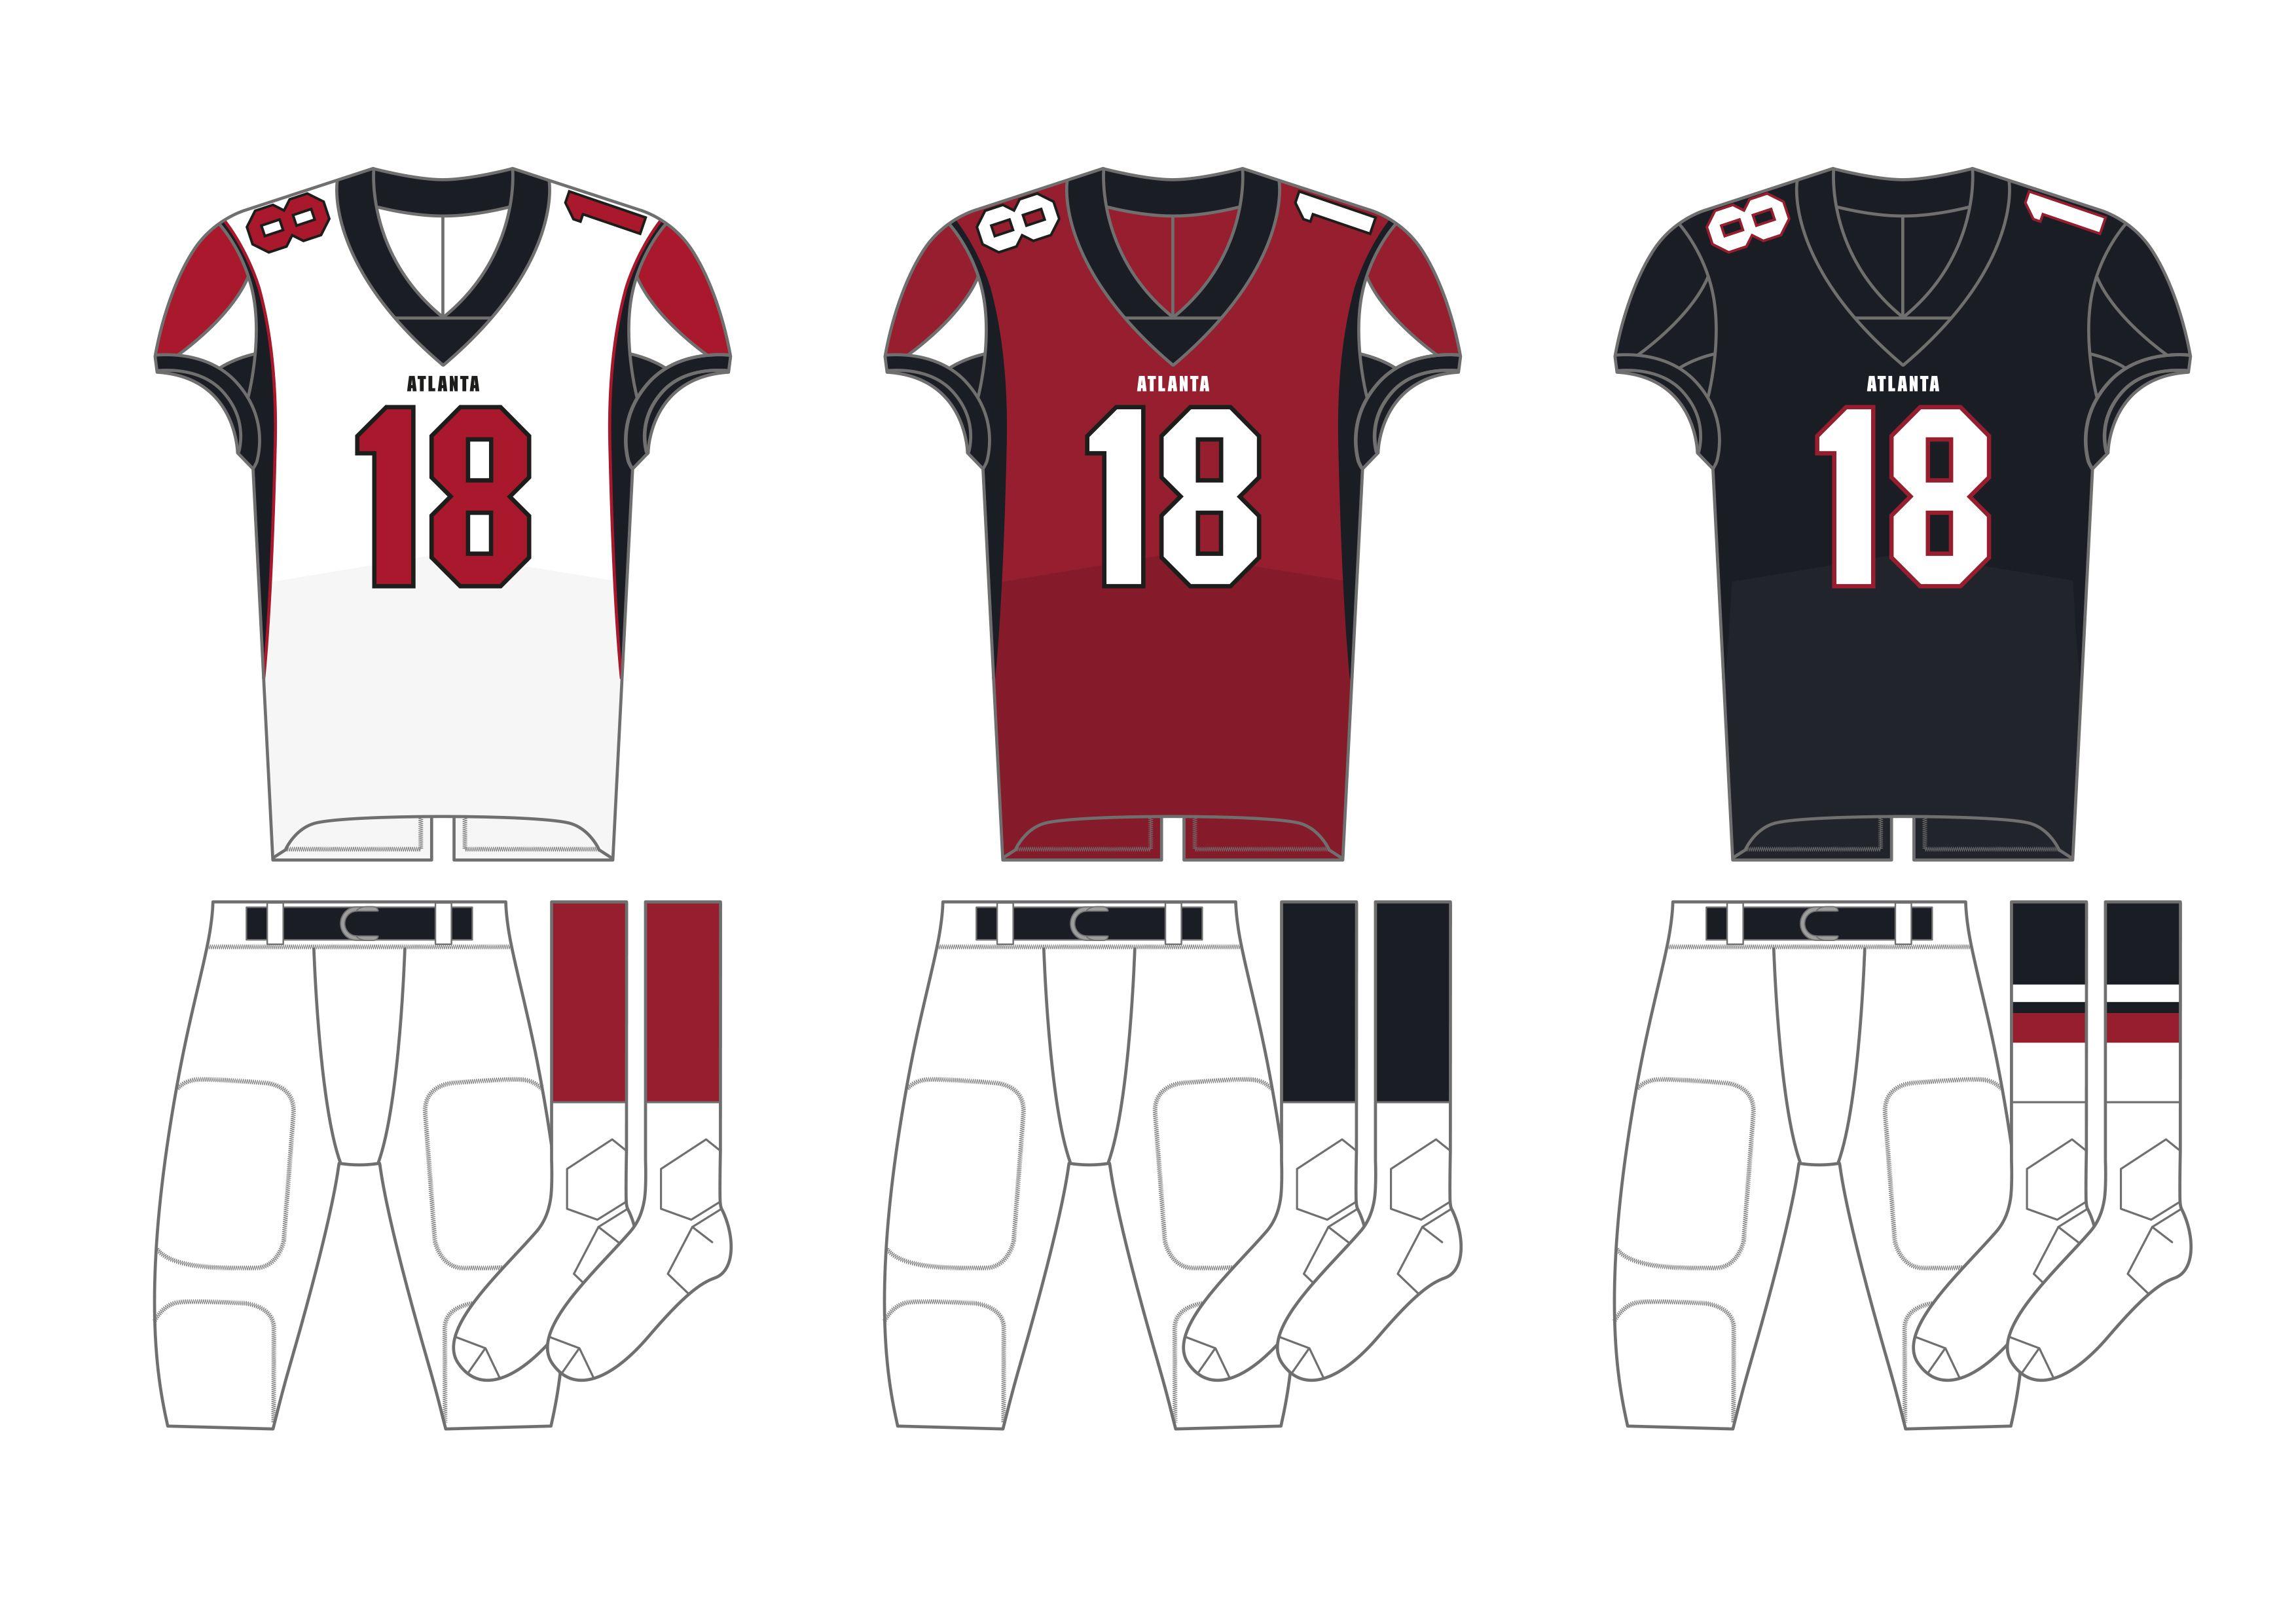 Atlanta Falcons Uniforms In 2020 Football Uniforms American Football Jersey Shirt